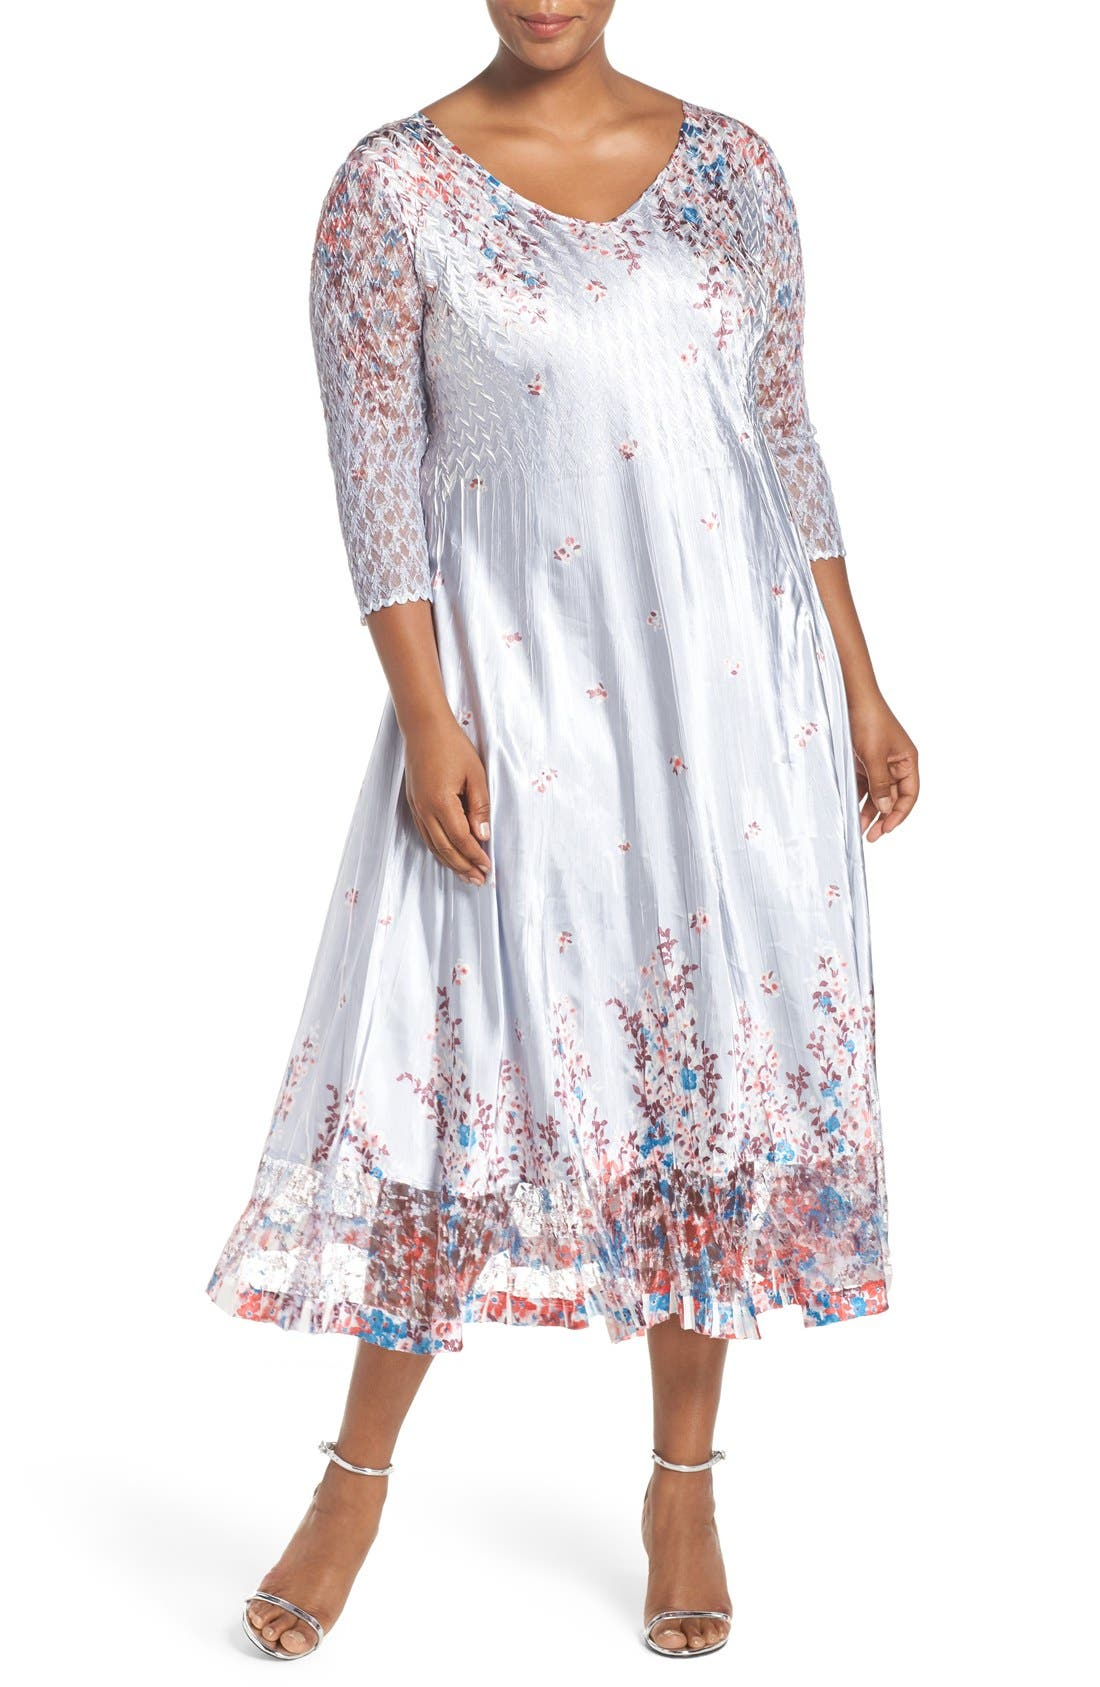 Alternate Image 1 Selected - Komarov Print Lace & Charmeuse V-Neck Dress (Plus Size)